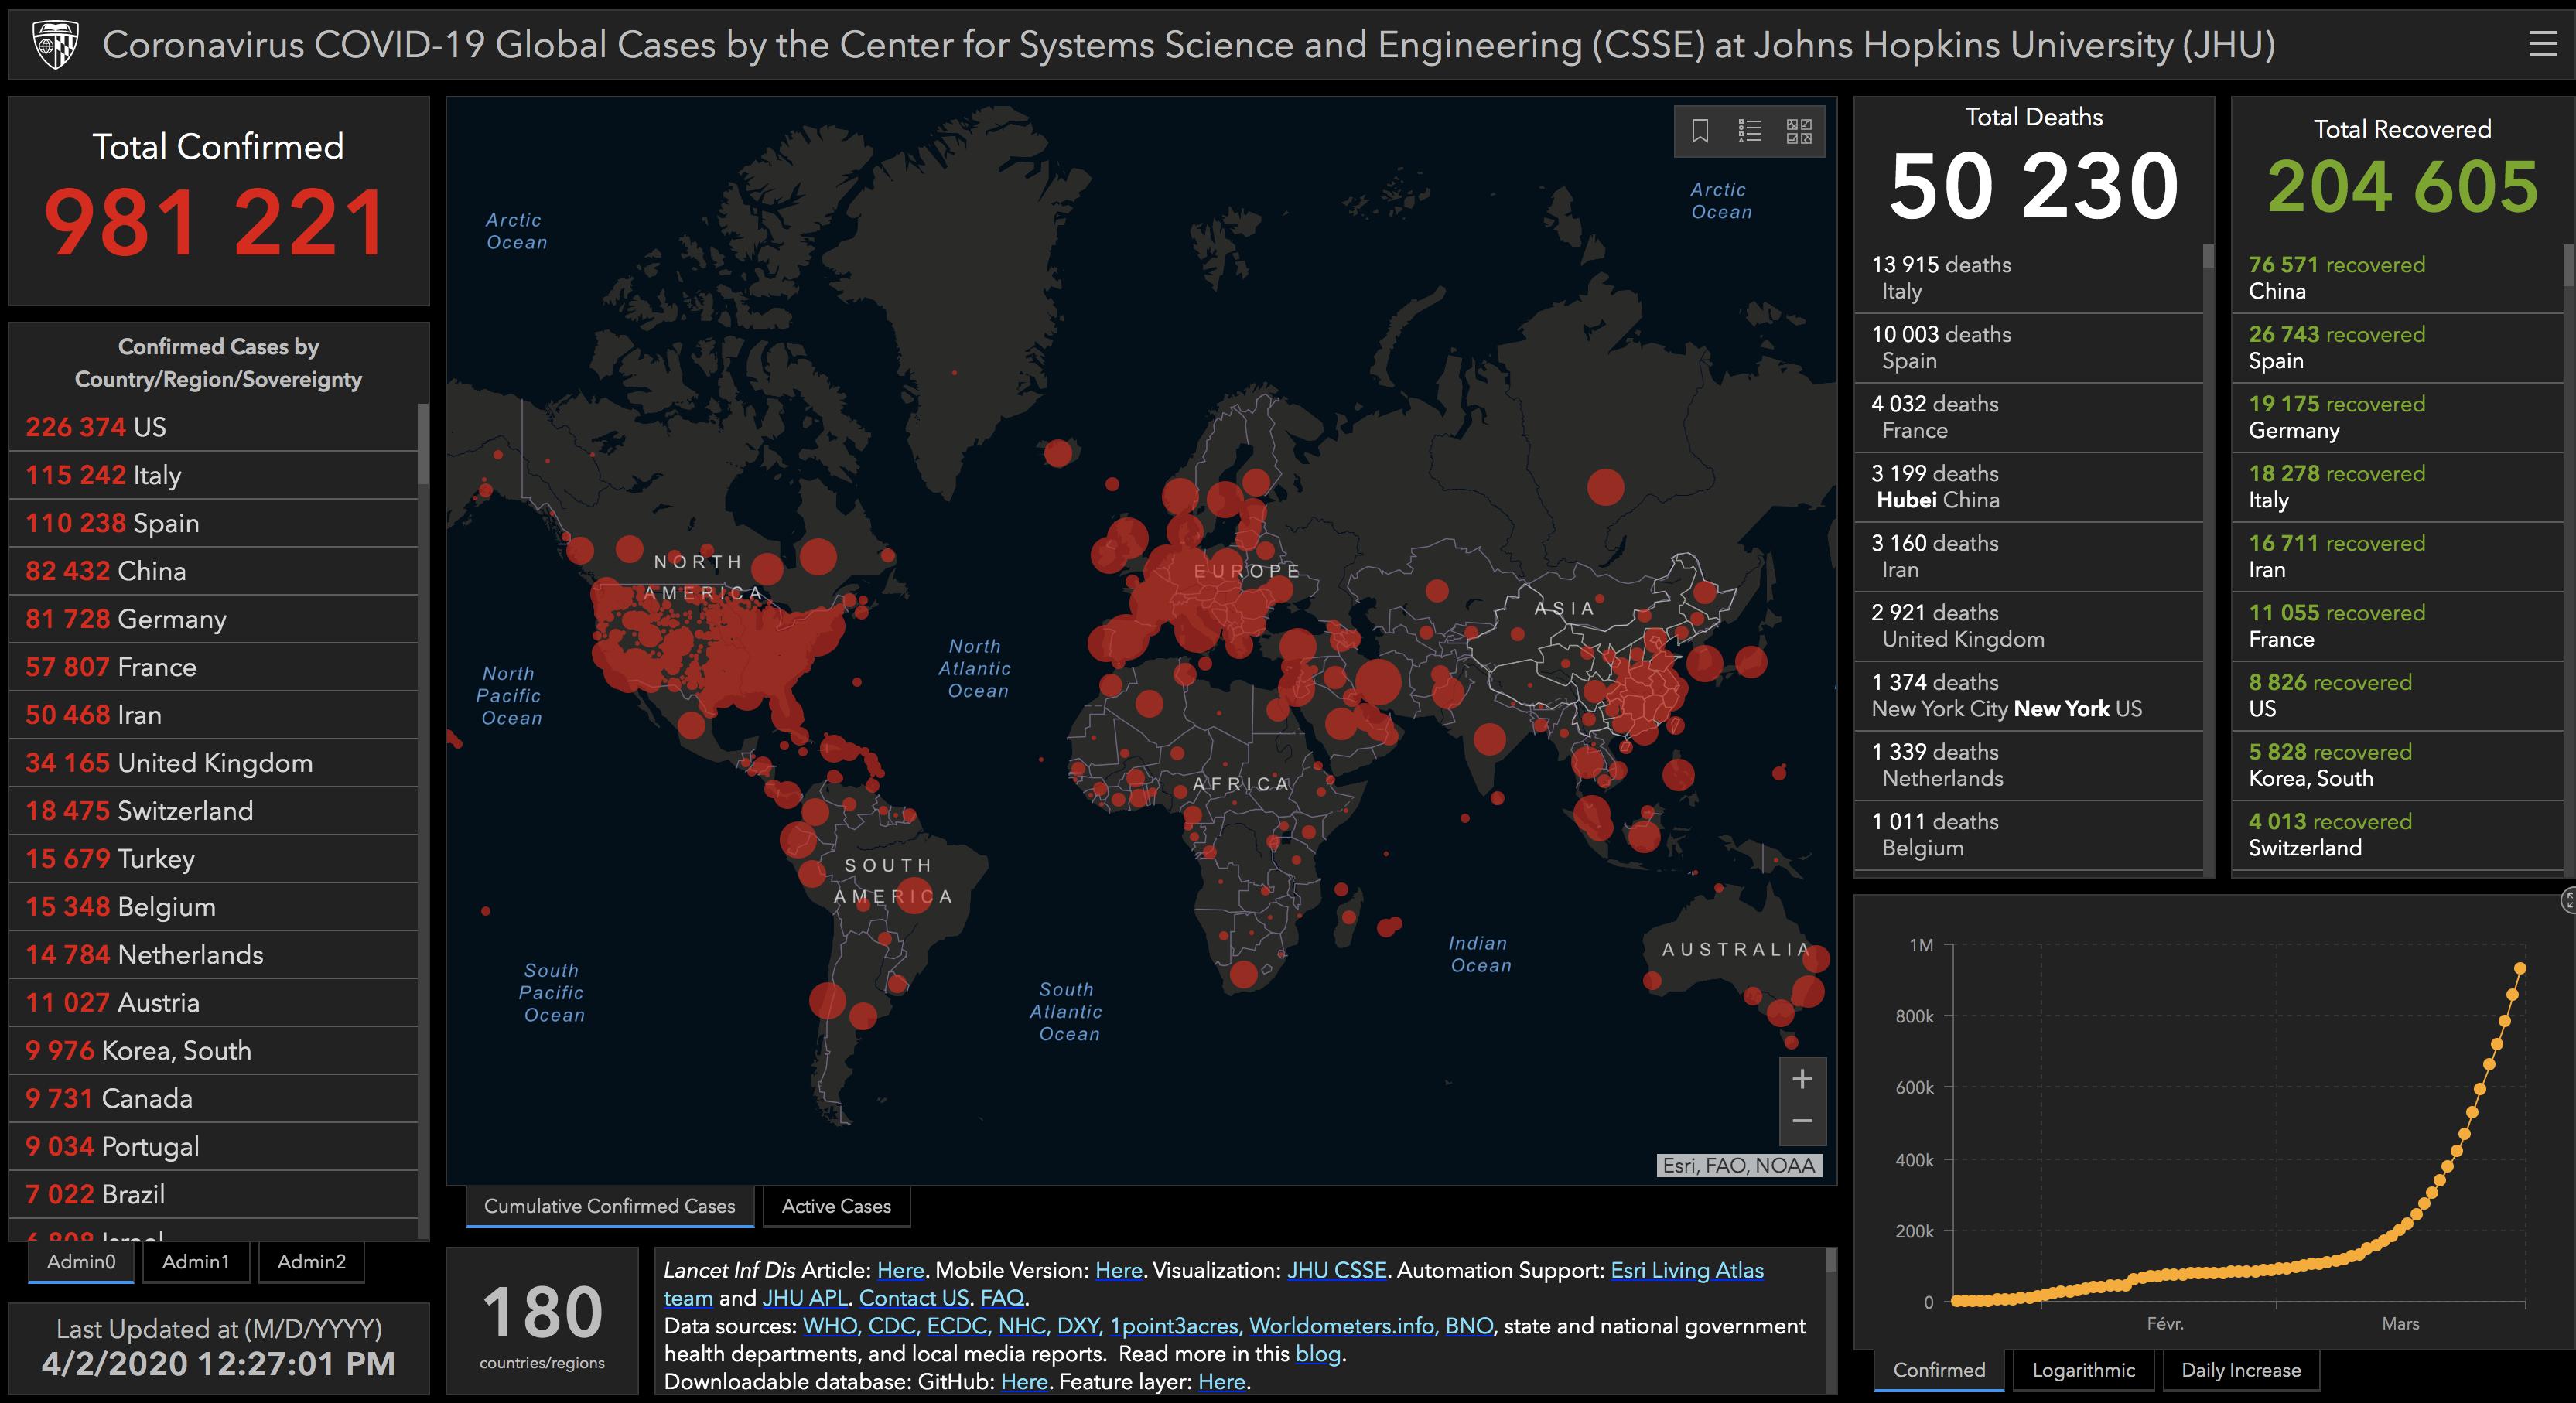 Monde - Coronavirus COVID-19 (2 avril 2020)